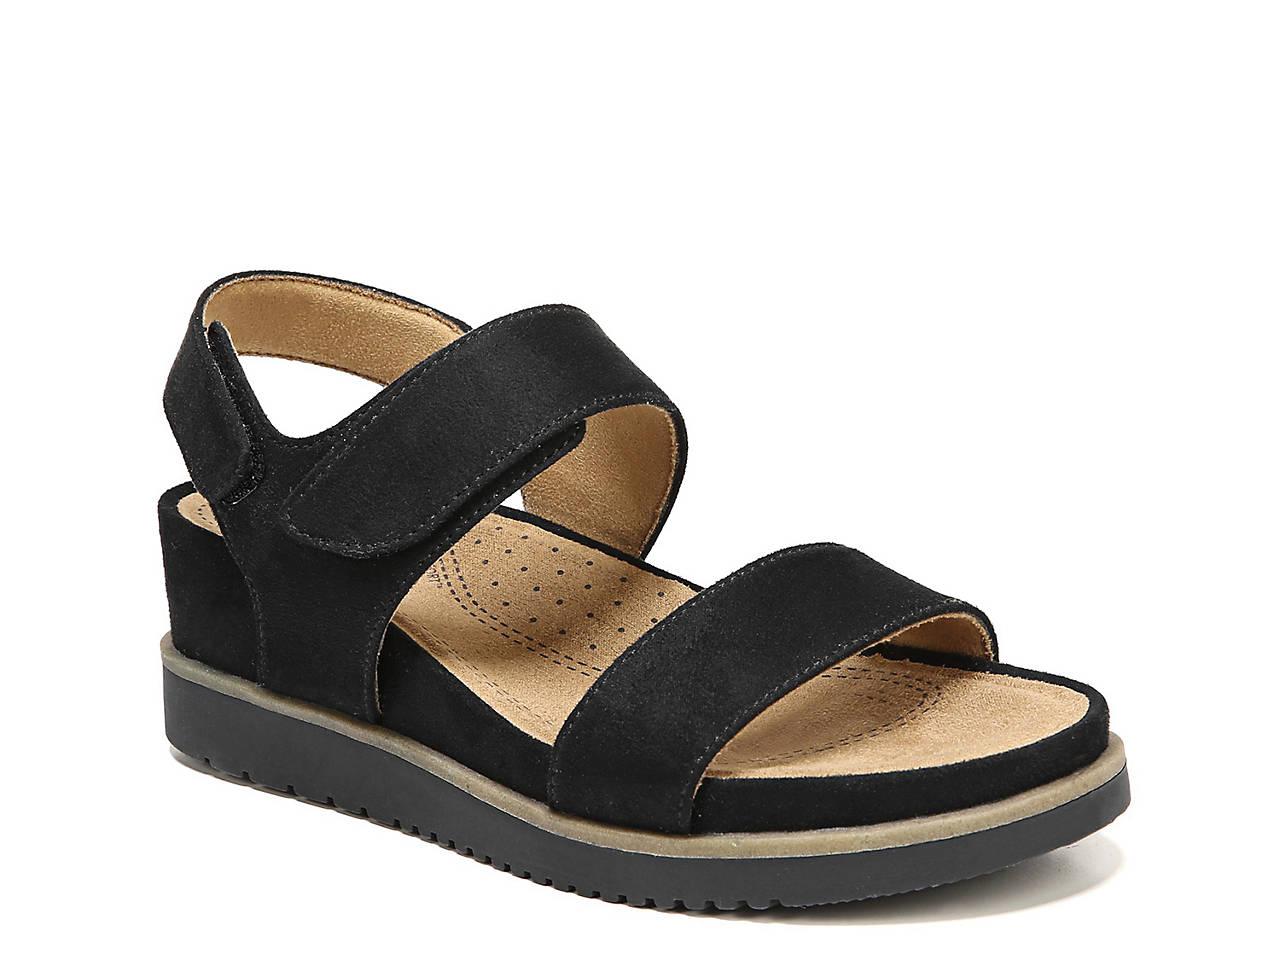 5c8fa392541b Natural Soul Kaila Wedge Sandal Women s Shoes